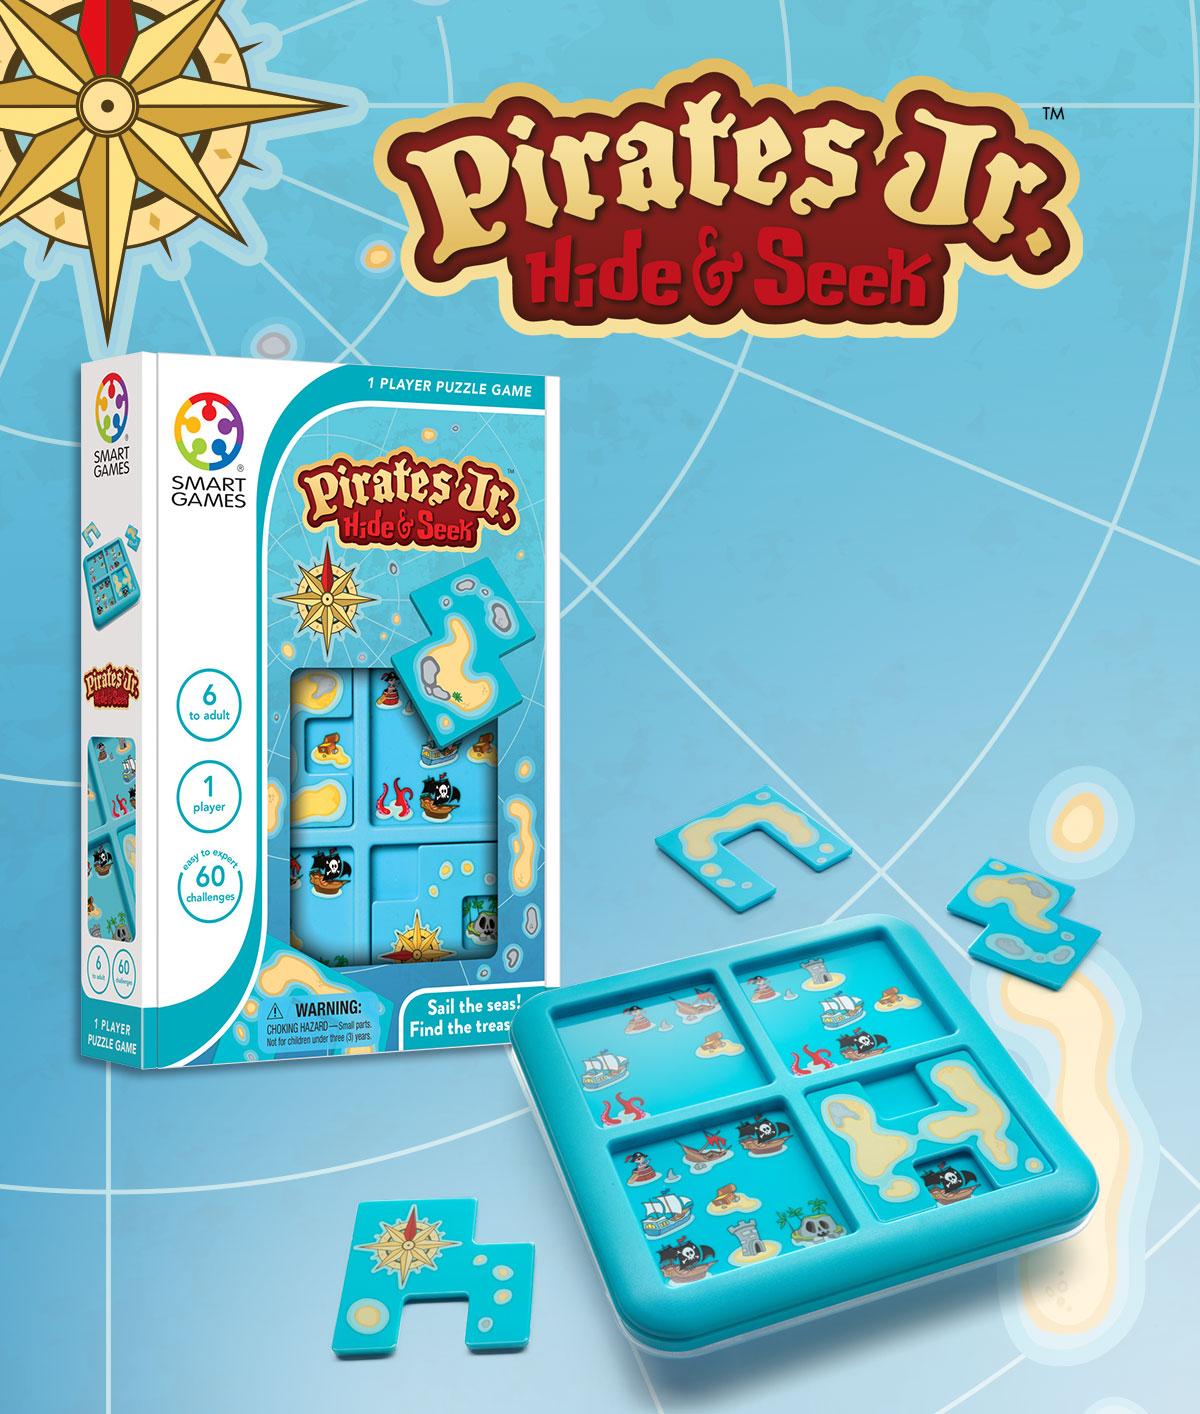 Pirates Jr – Hide & Seek